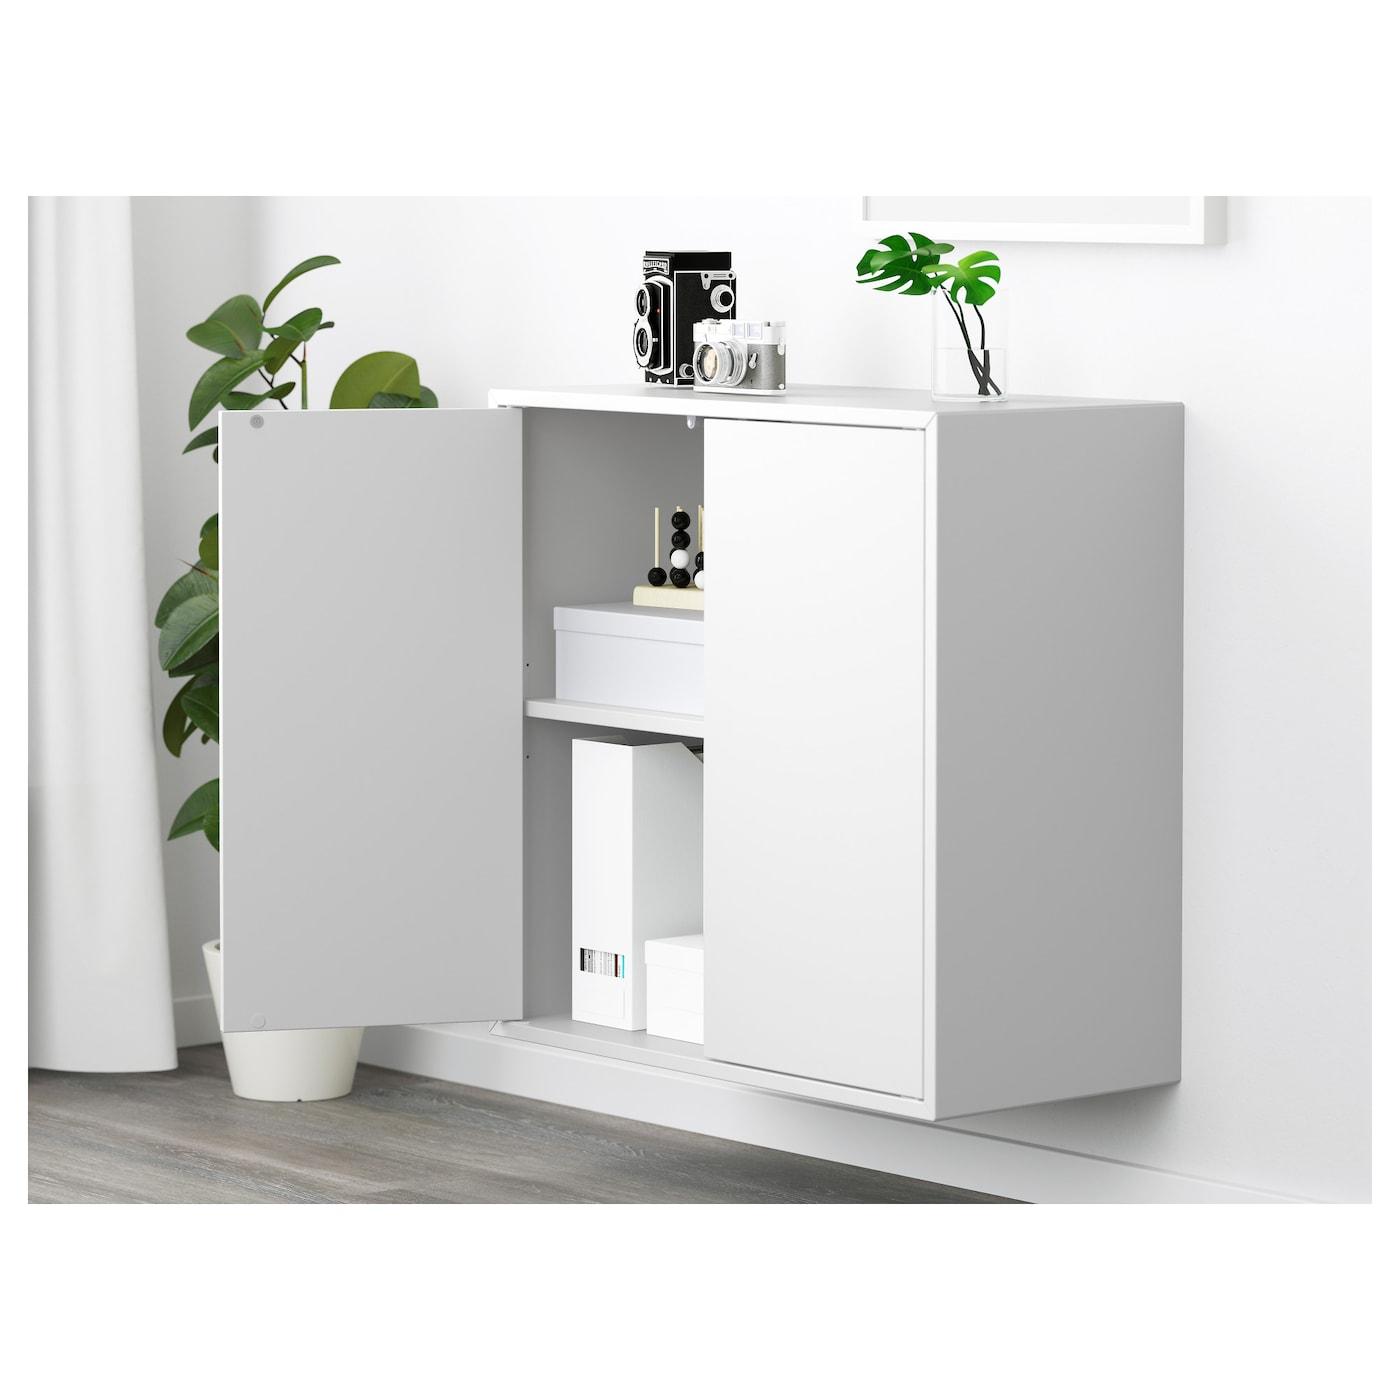 eket kast met 2 deuren en 1 plank wit 70 x 35 x 70 cm ikea. Black Bedroom Furniture Sets. Home Design Ideas